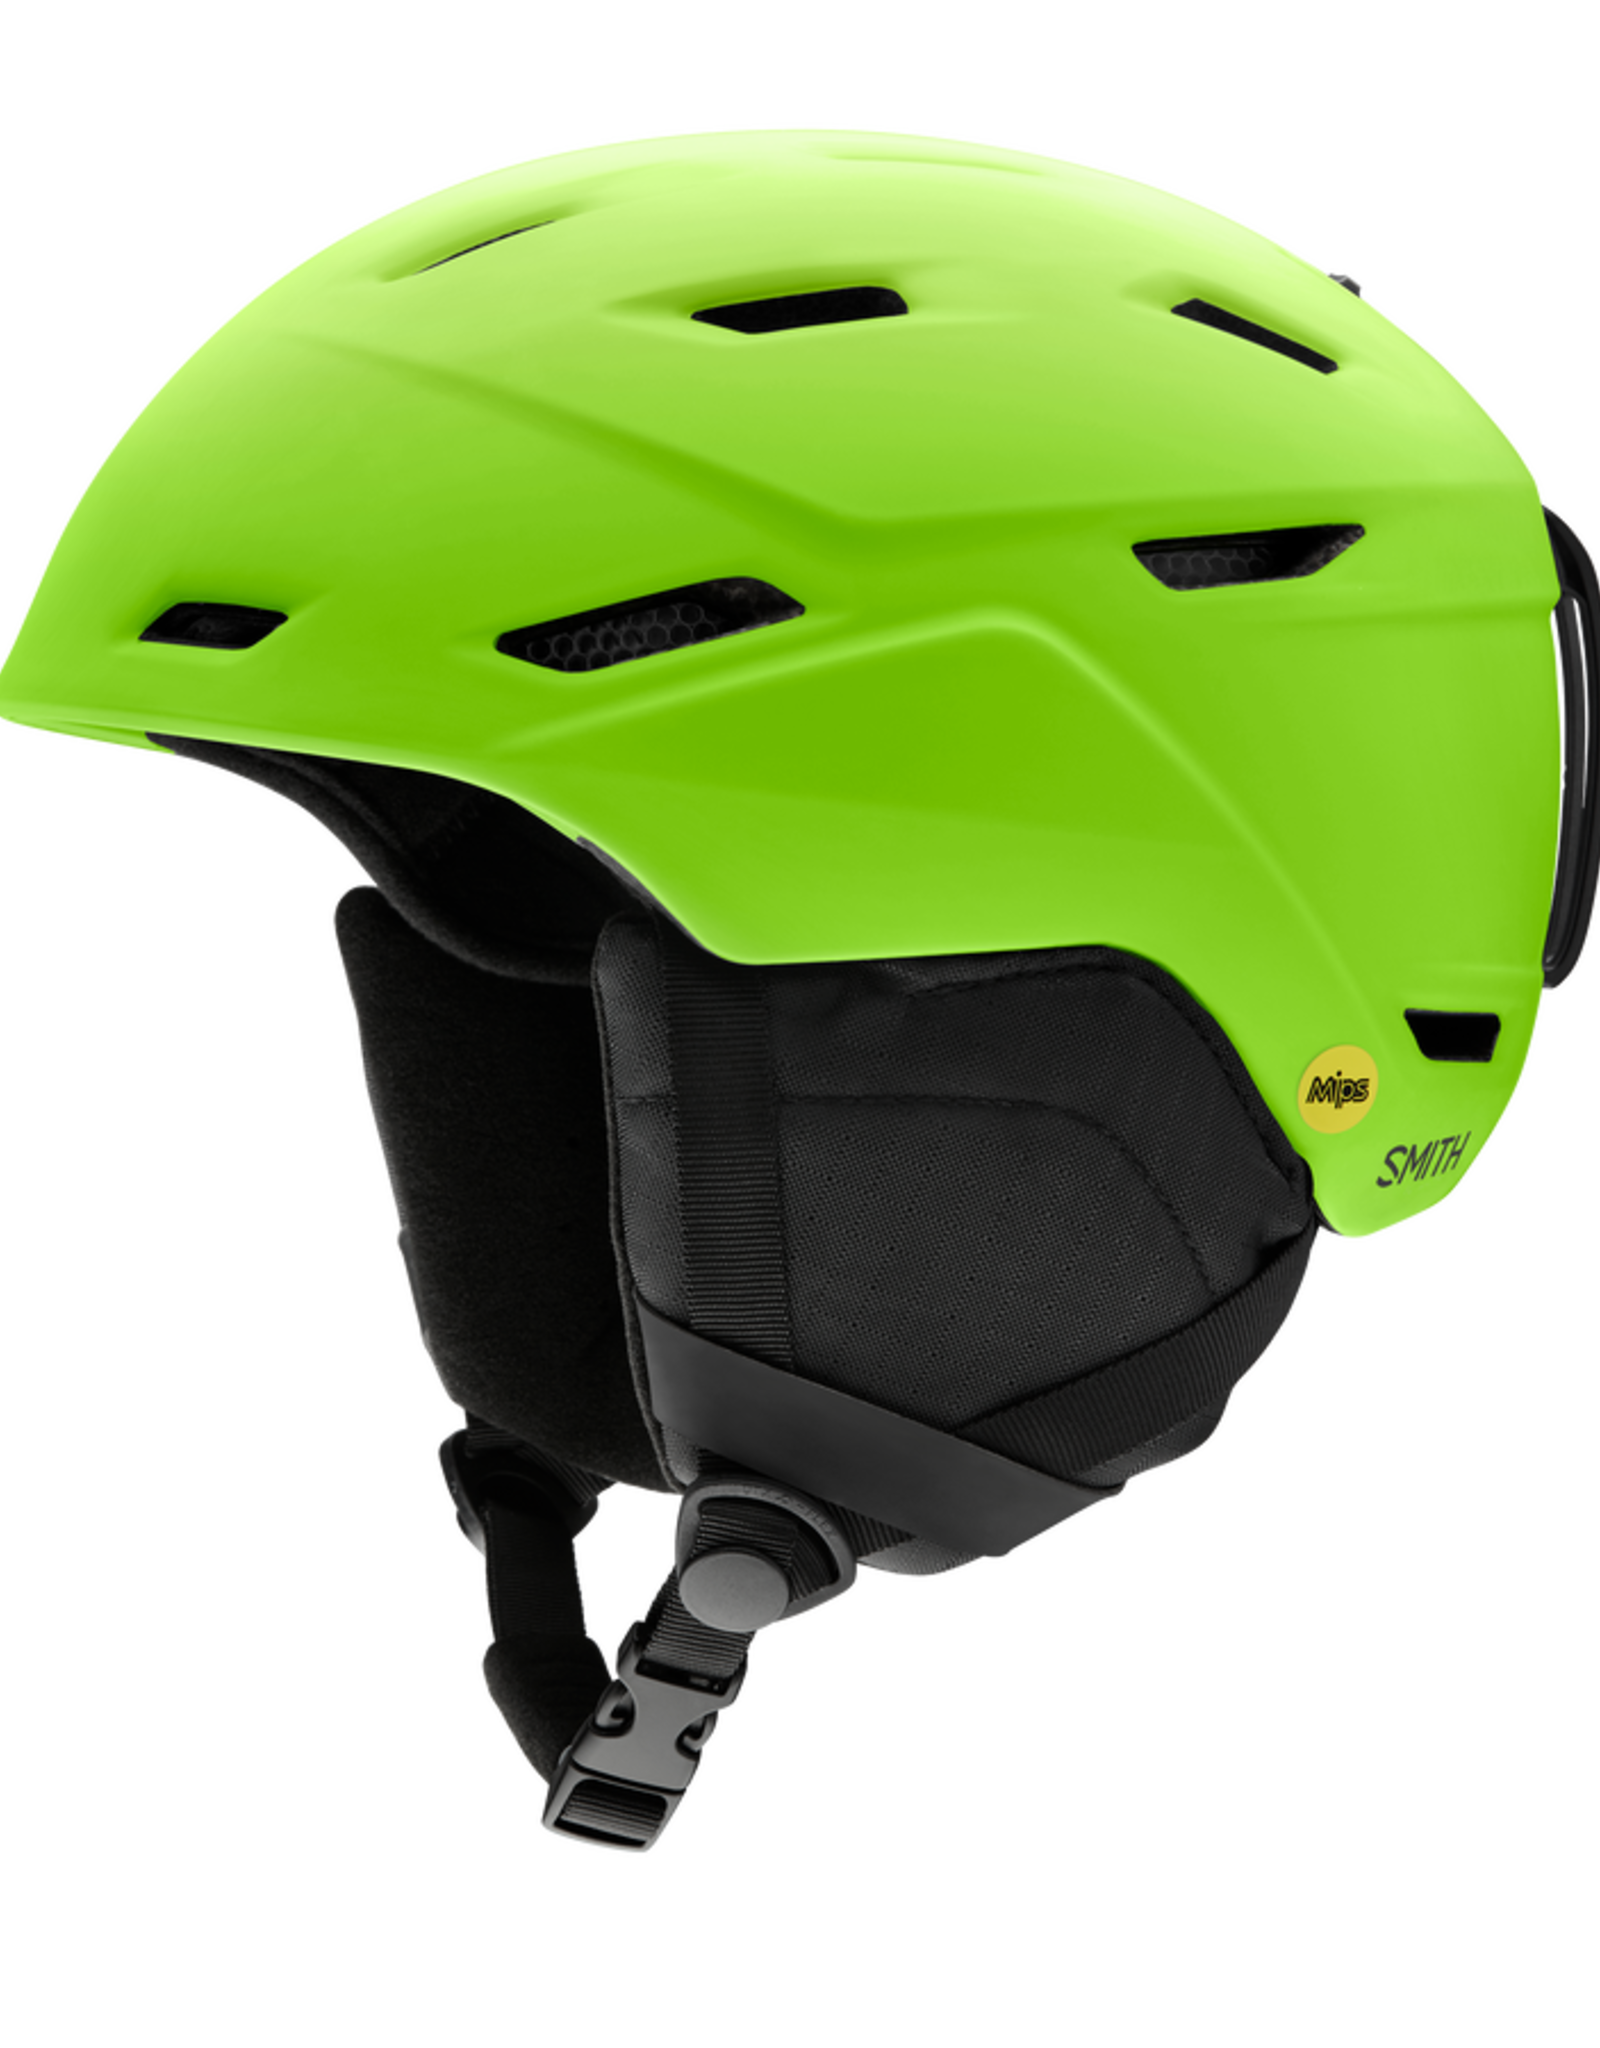 Smith Smith Mission Ski Helmet